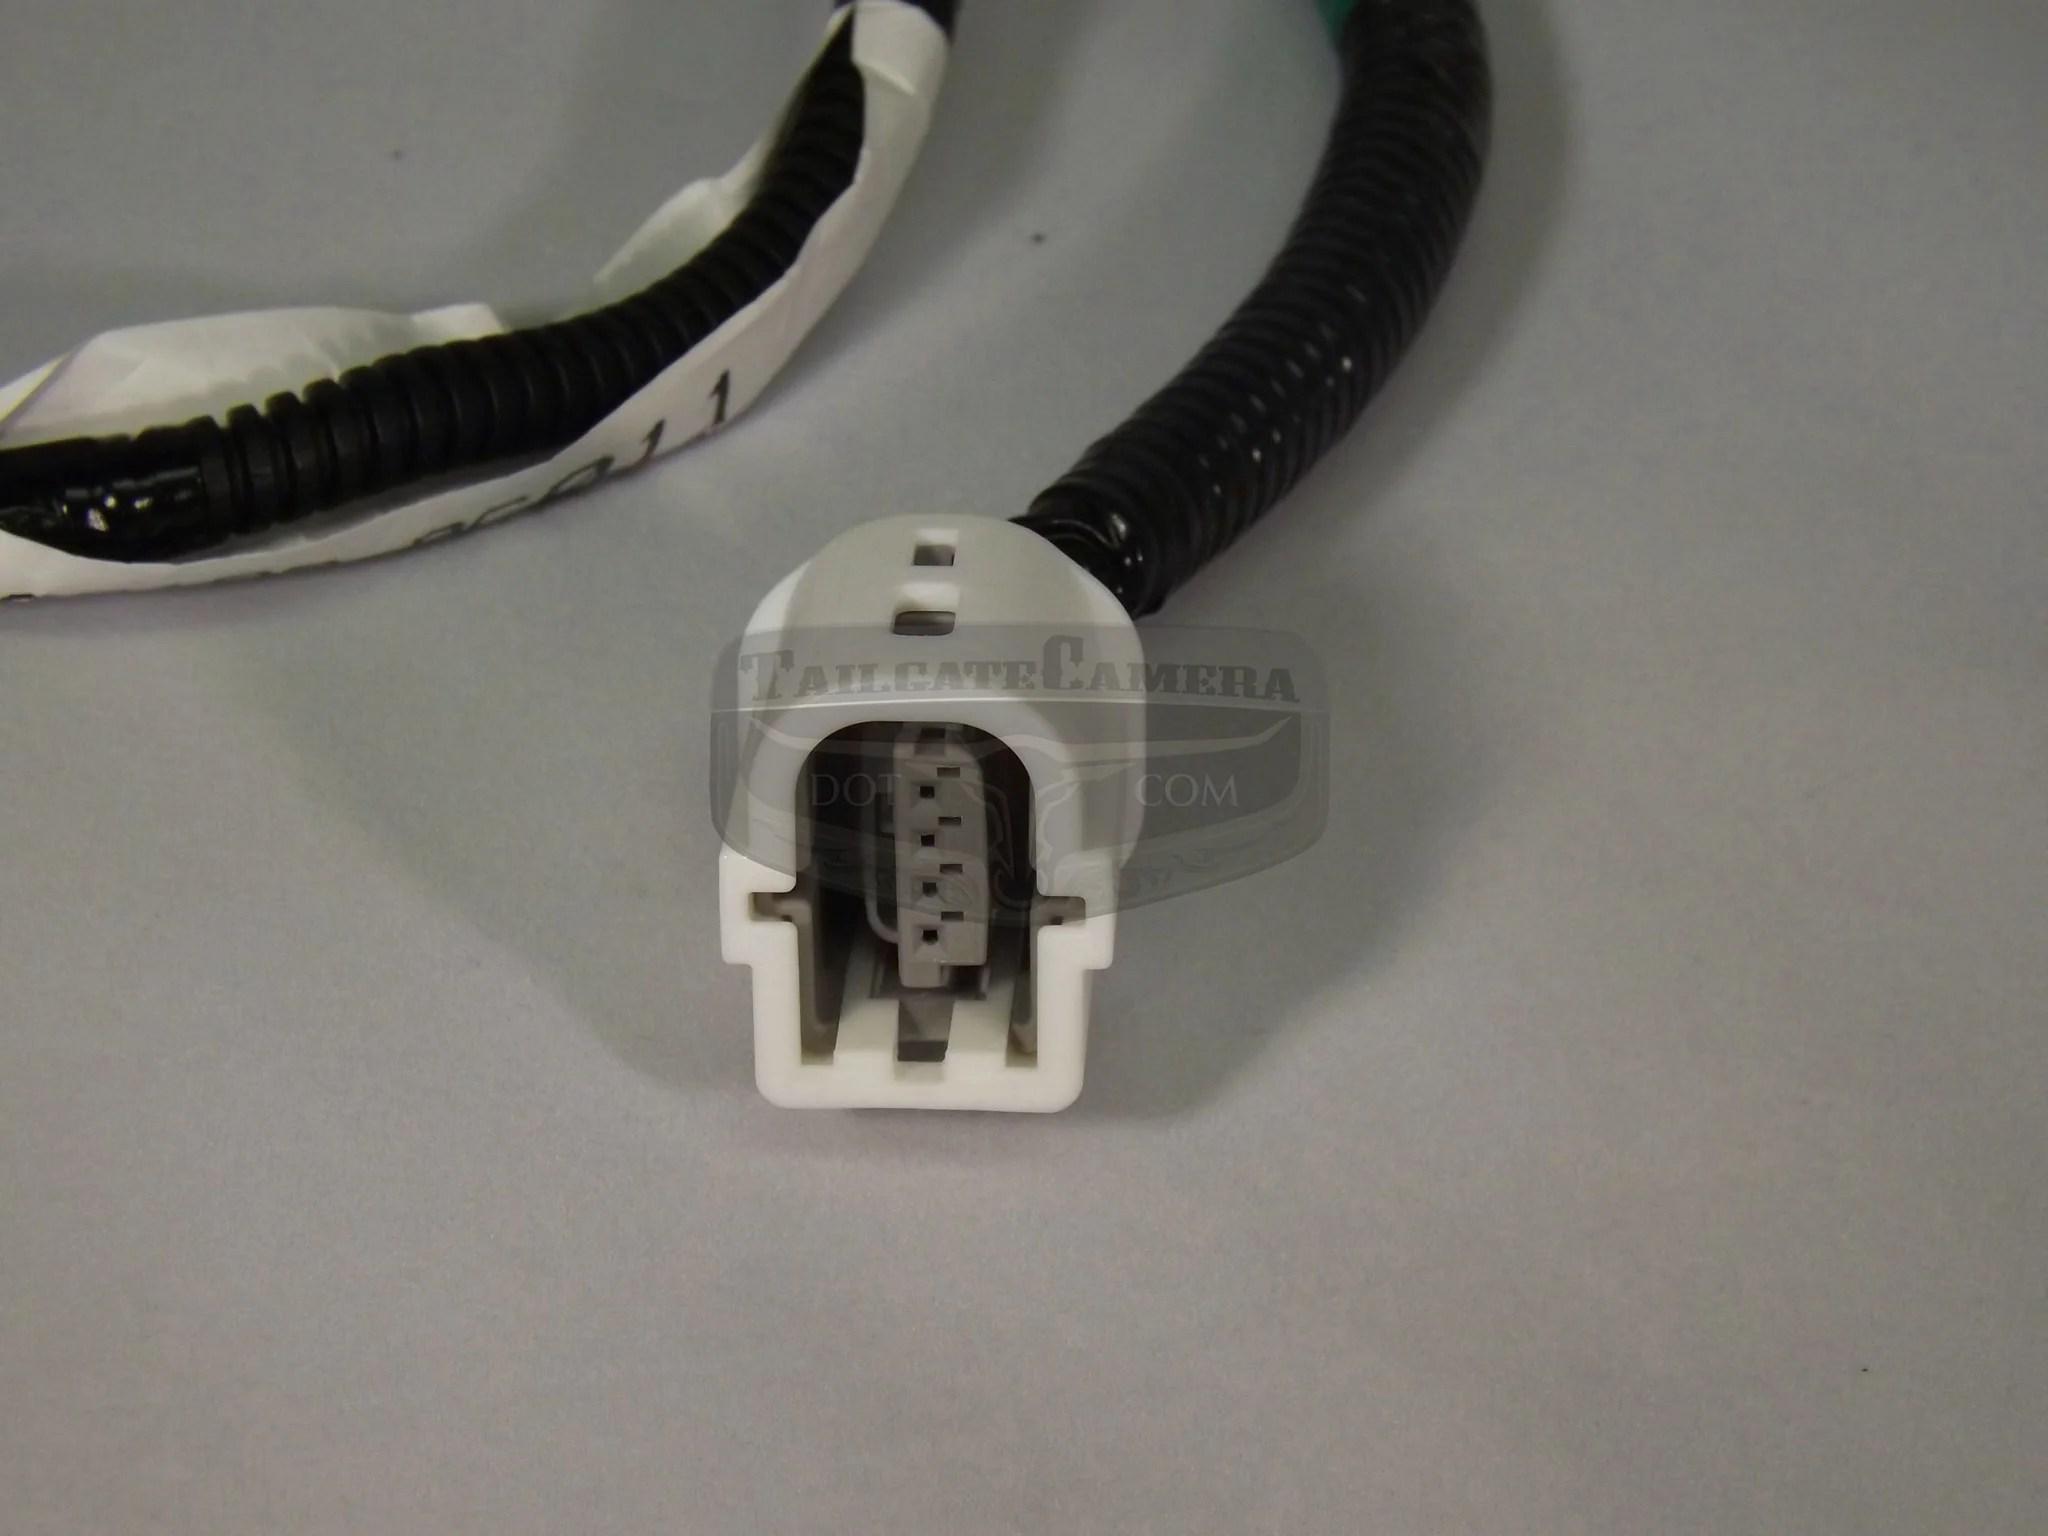 backup camera wiring harness wiring diagram post reverse camera wiring harness 2010 2013 tundra hd camera [ 2048 x 1536 Pixel ]